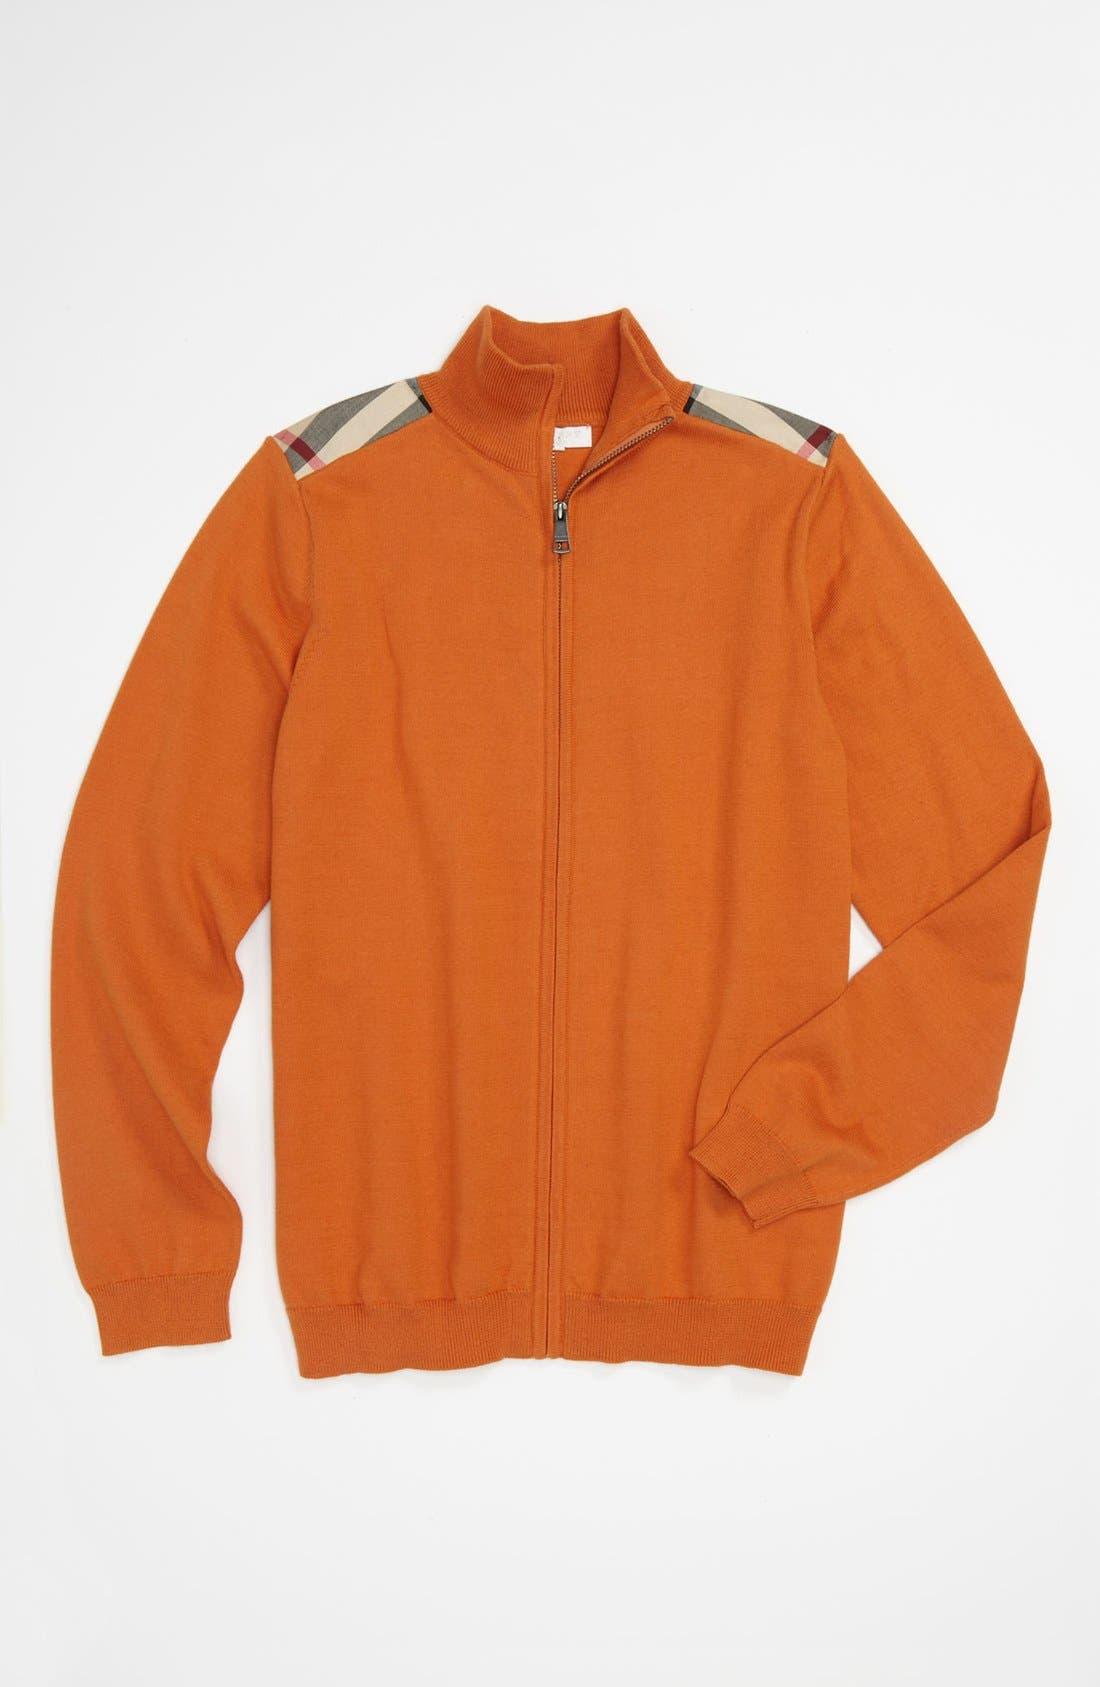 Alternate Image 1 Selected - Burberry Full Zip Sweater (Little Boys & Big Boys)